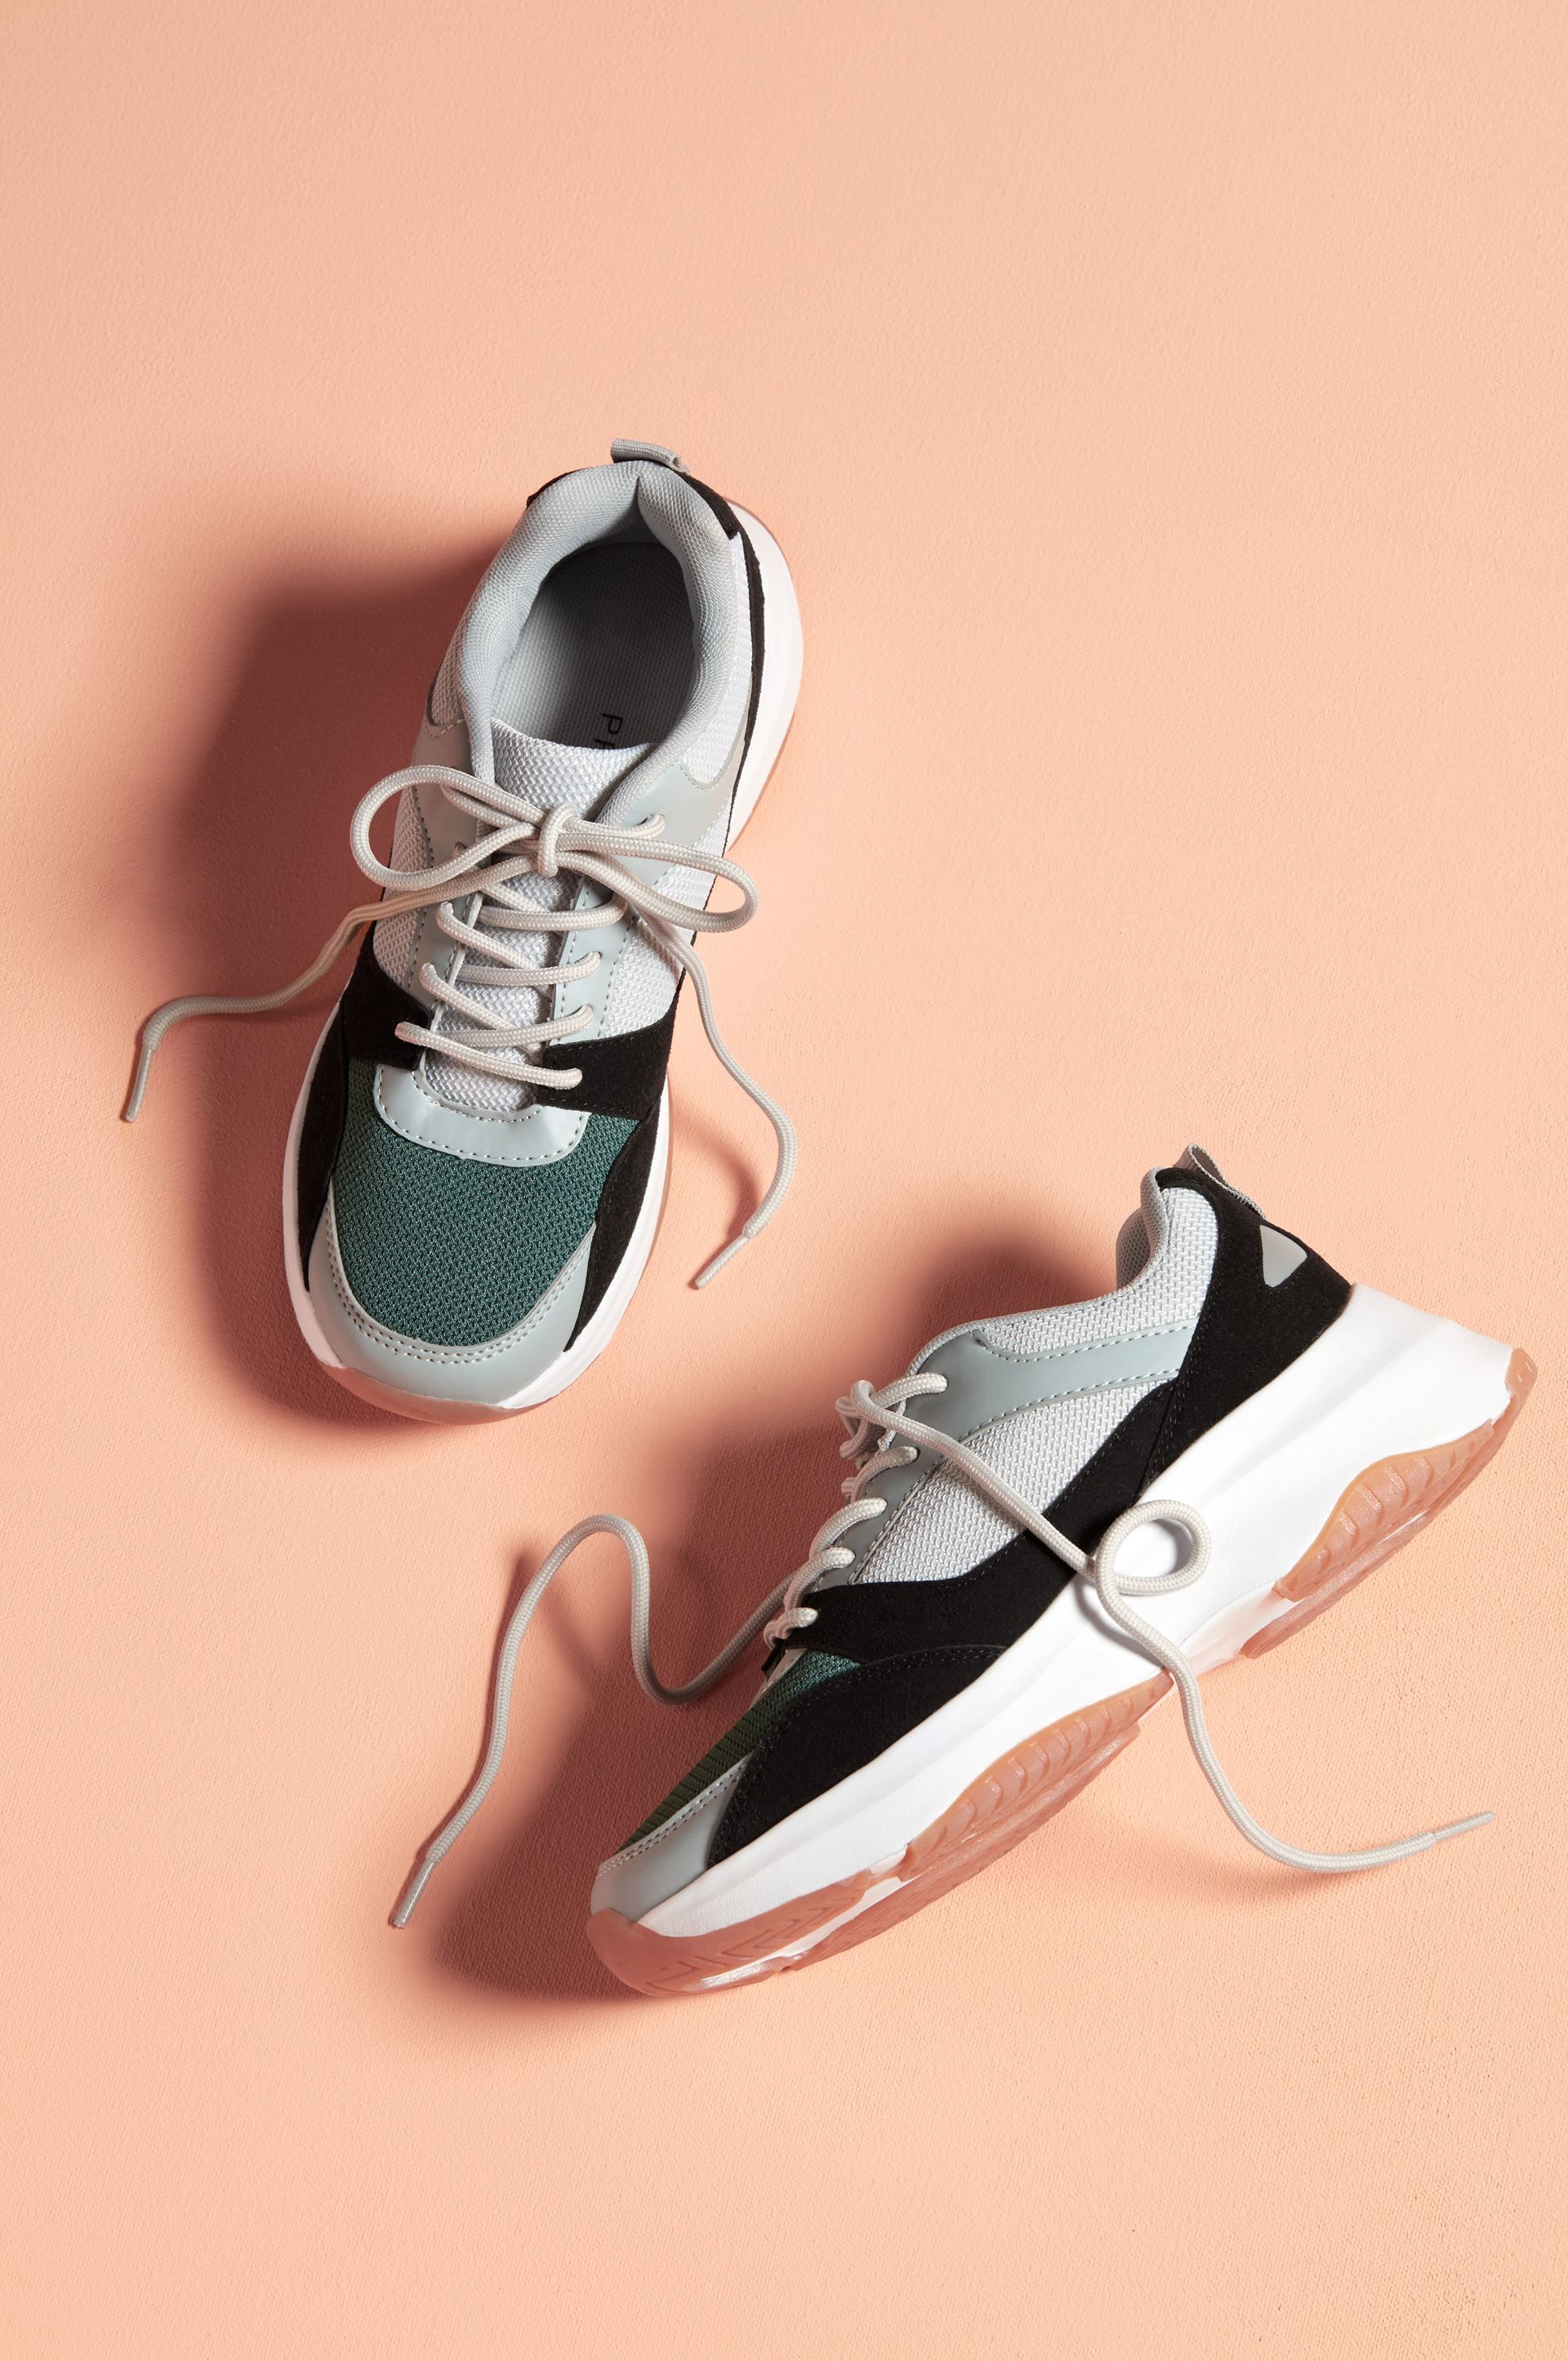 Primark womenswear chunky trainers